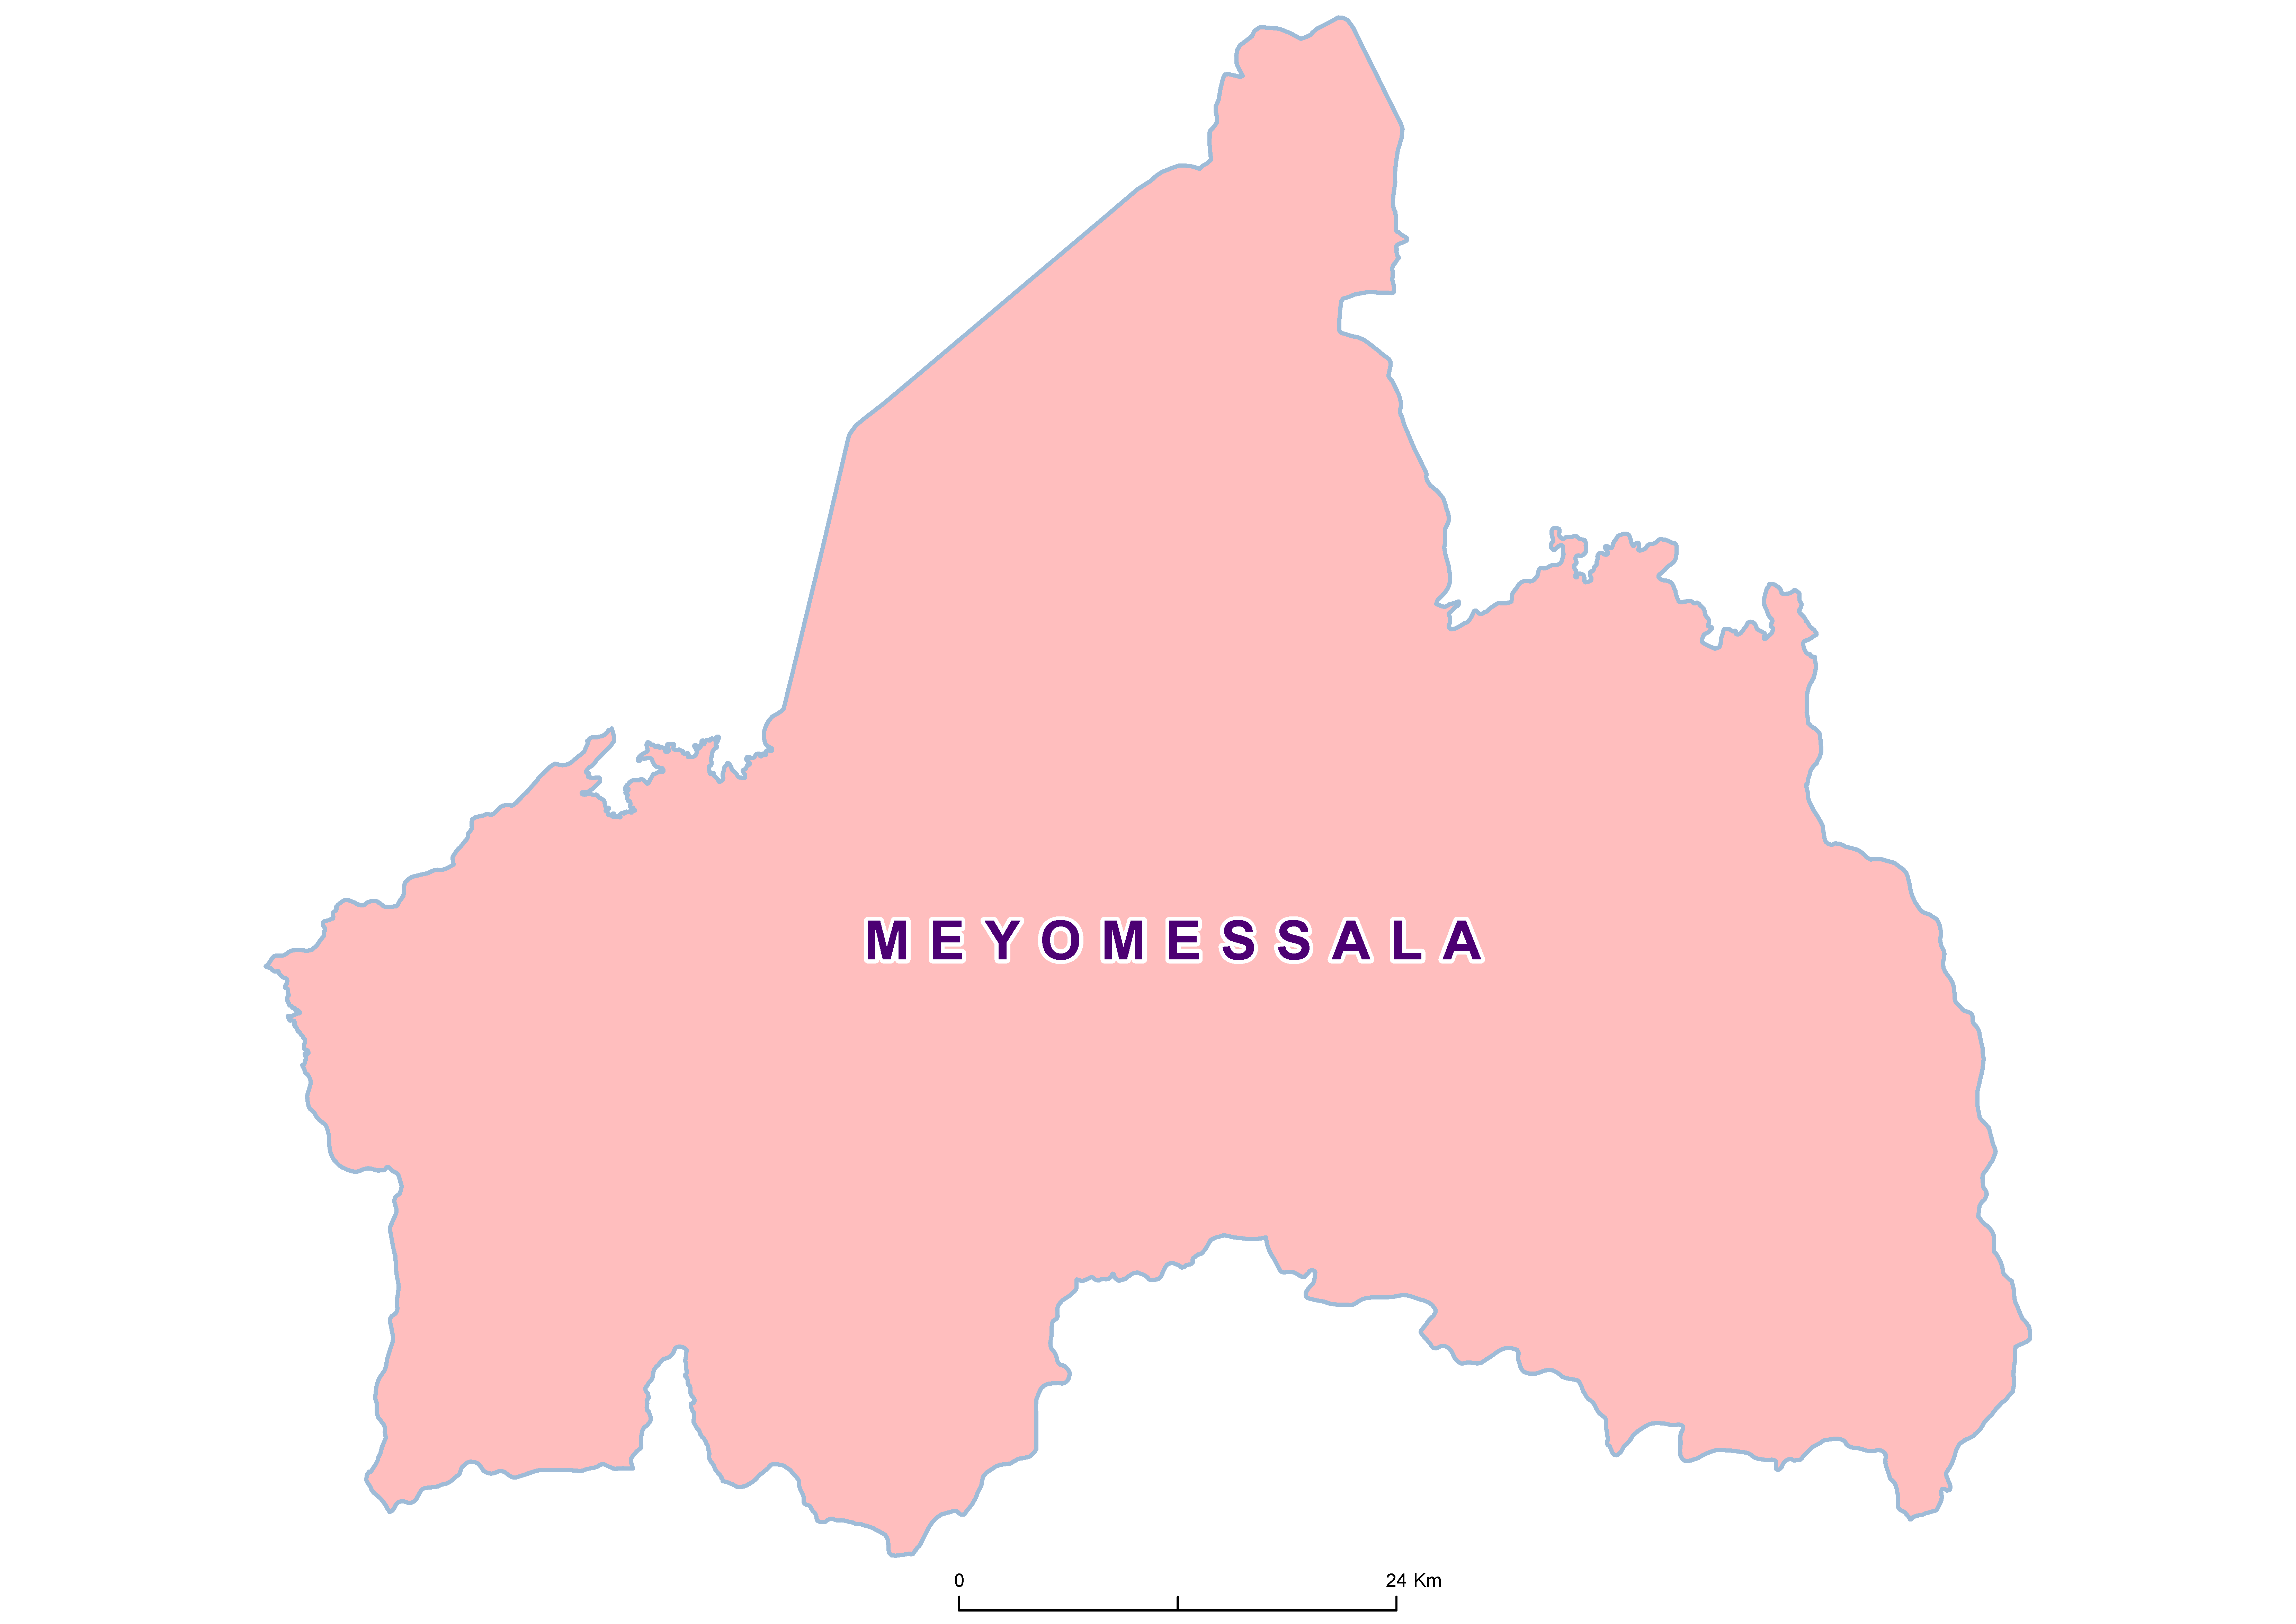 Meyomessala Mean SCH 19850001